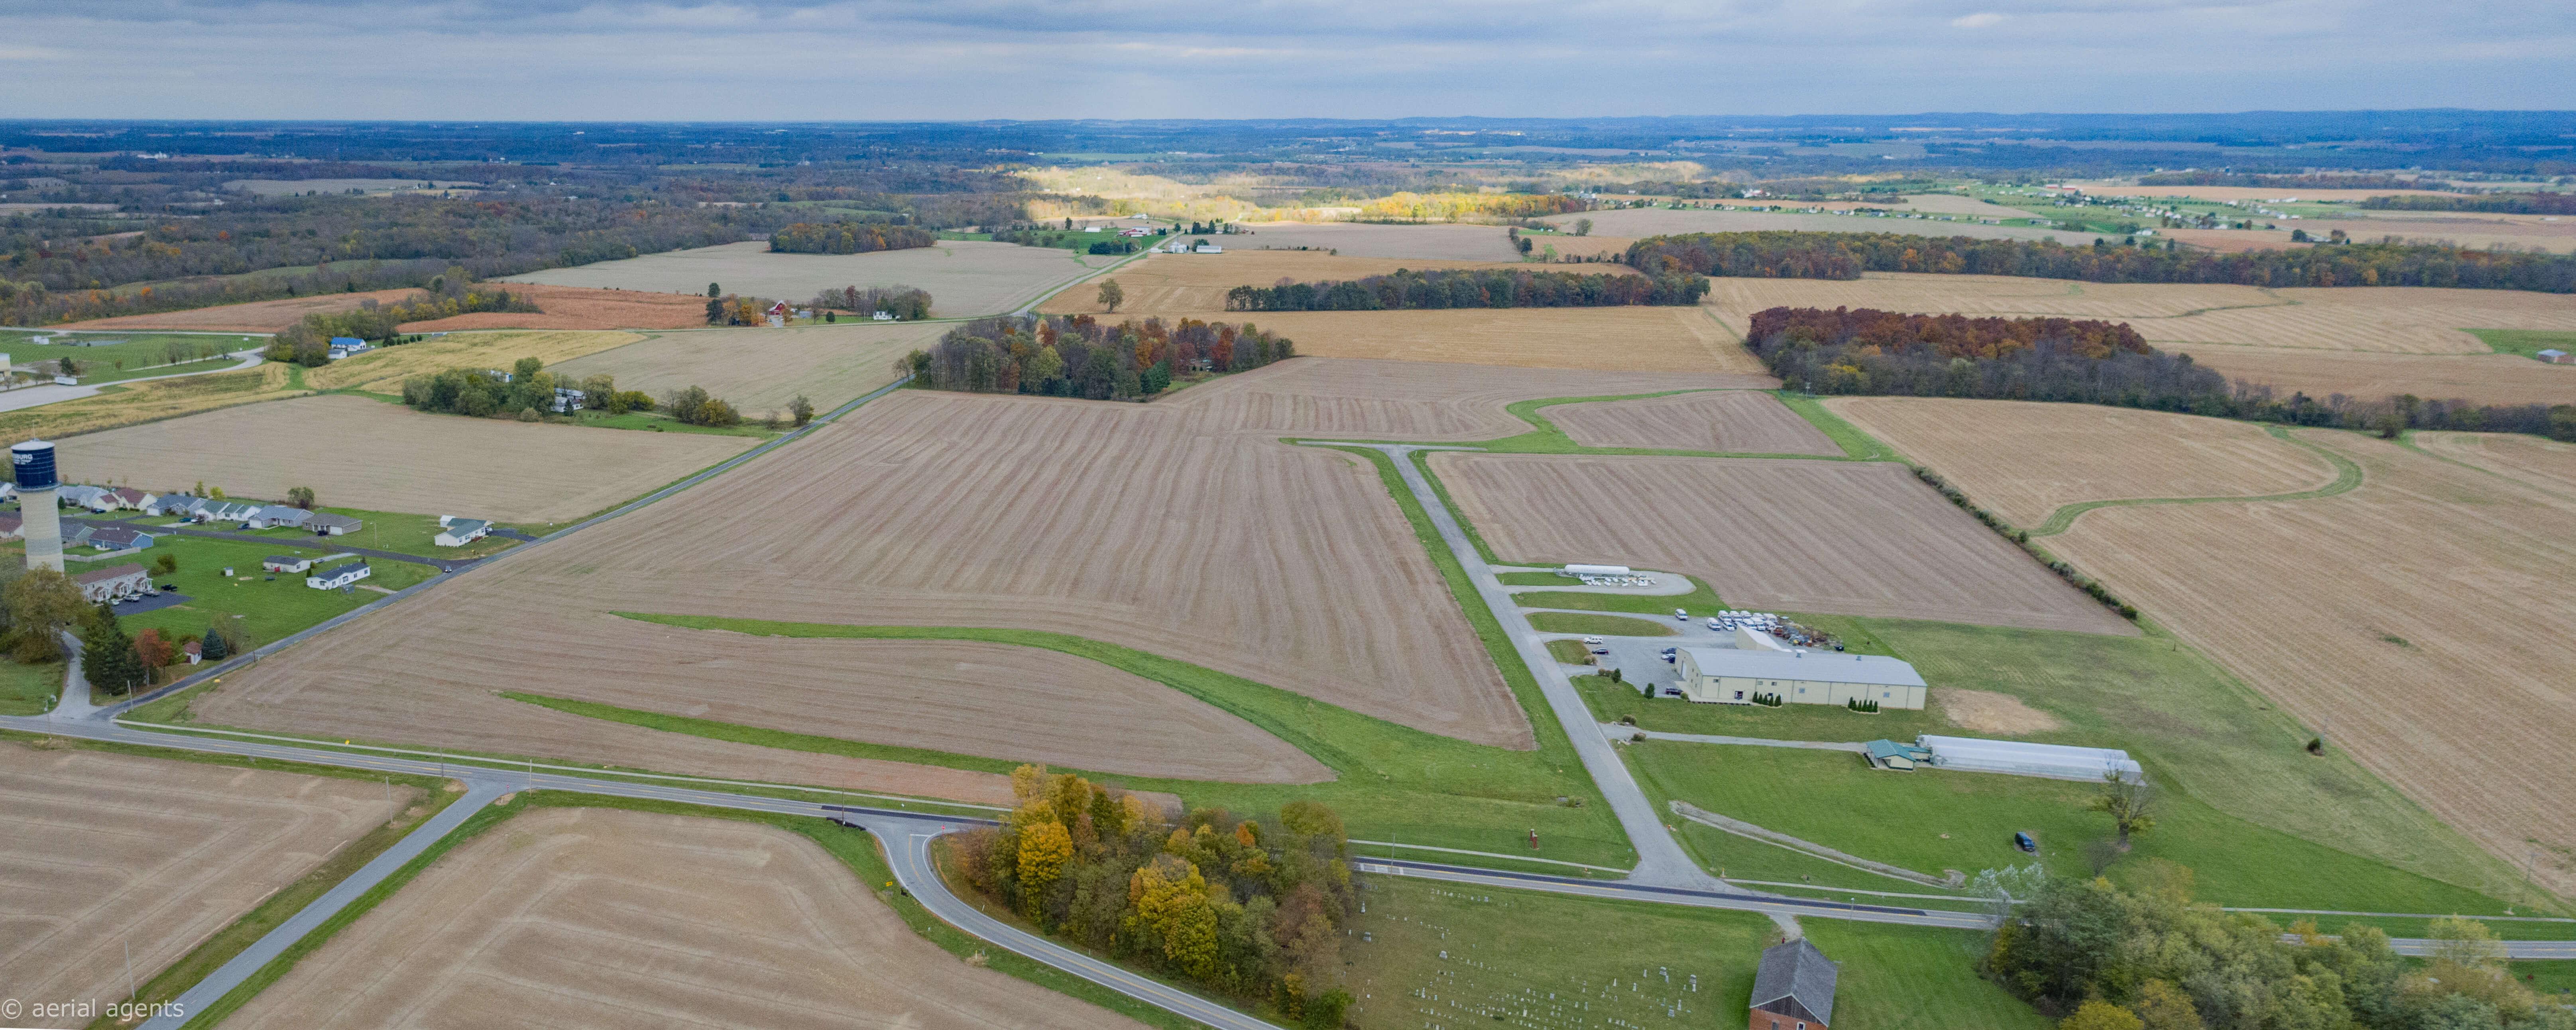 Leesburg Industrial Park Overview Image